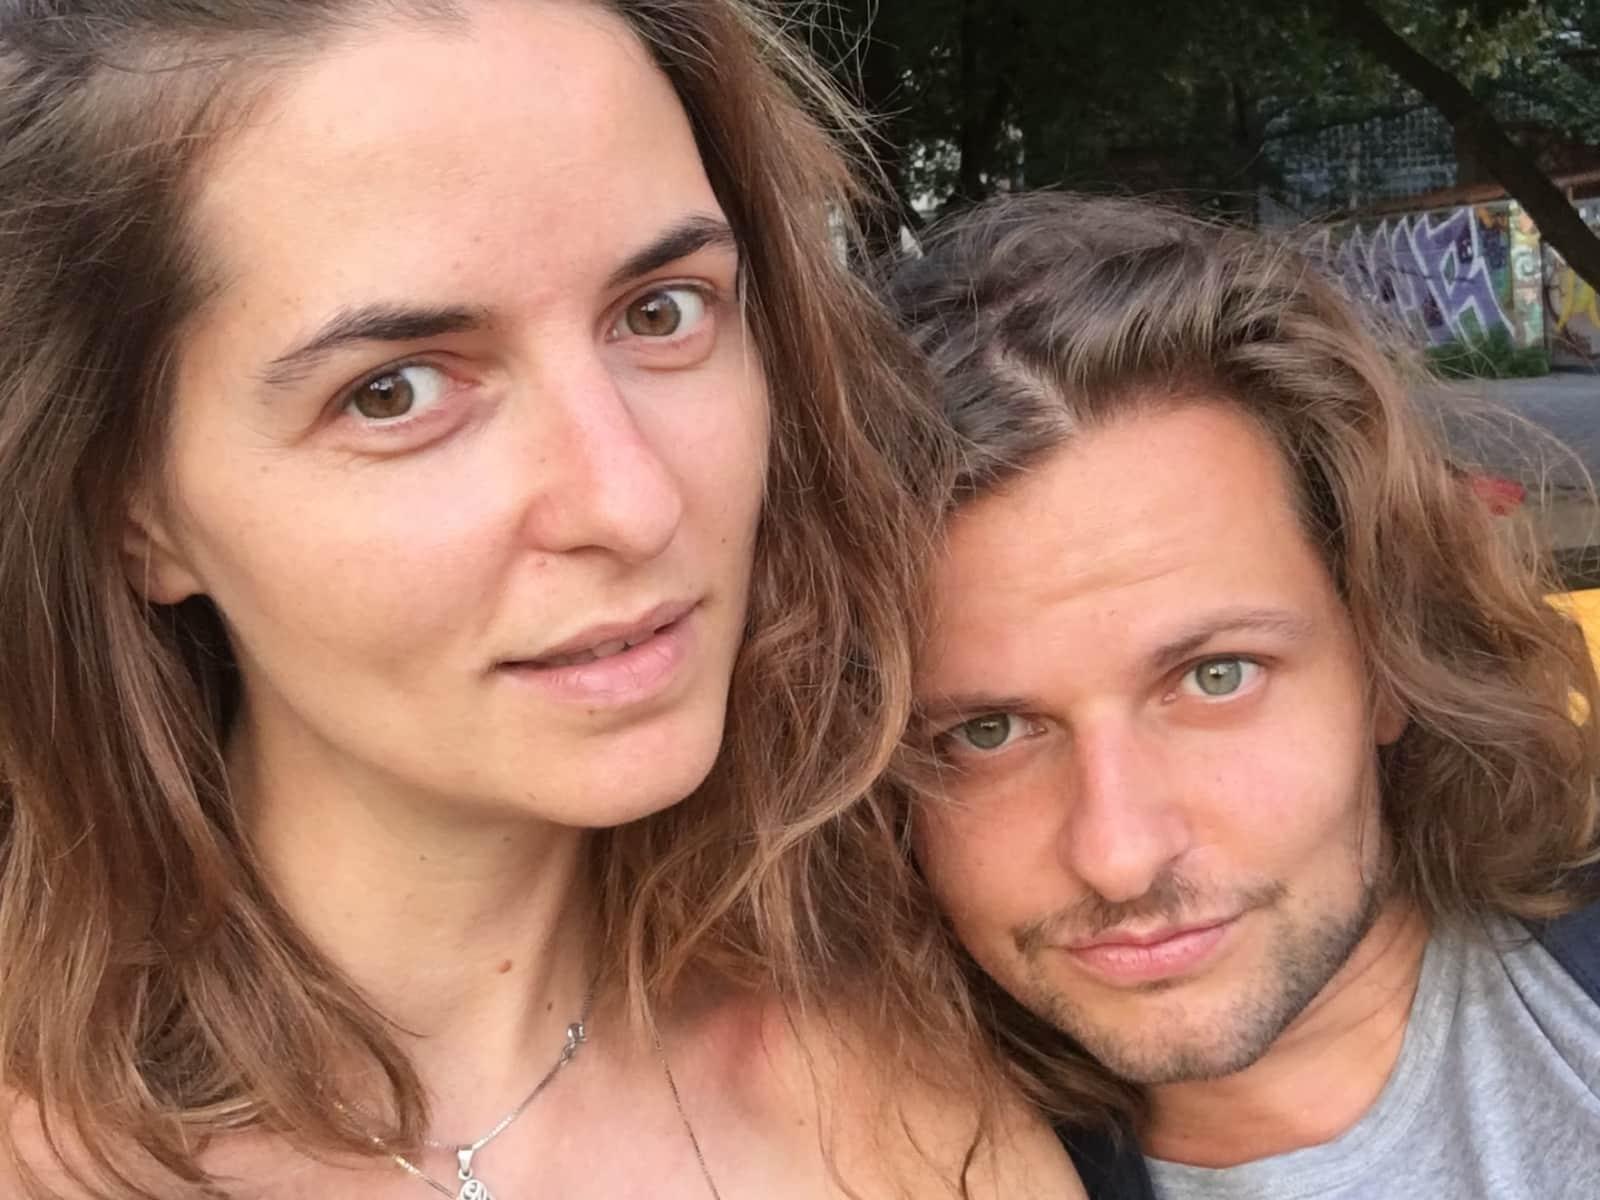 Nadja & David from Los Angeles, California, United States